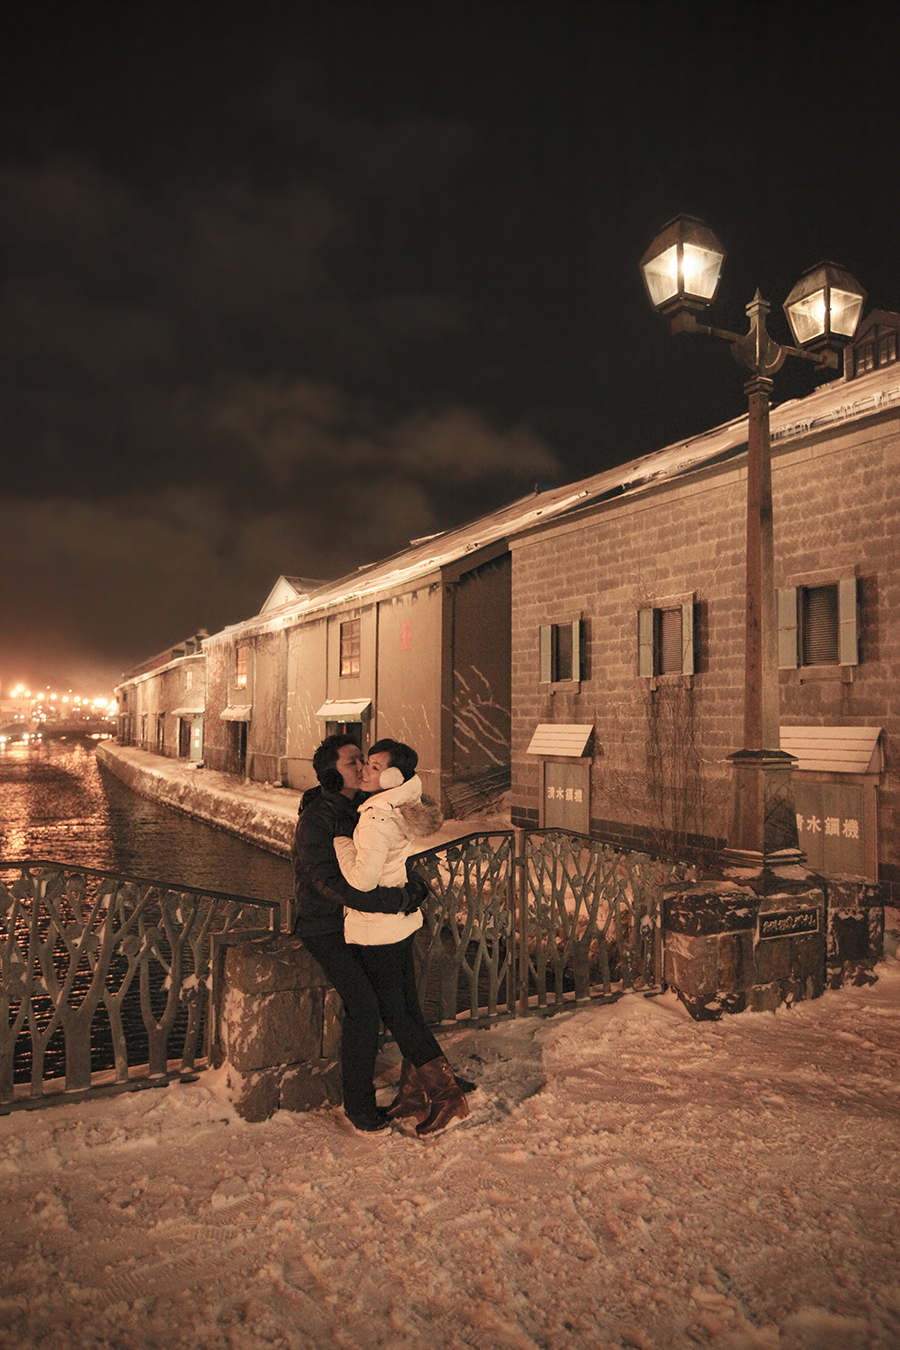 hokkaido tokyo japan . wedding photography by kurt ahs . 5055.jpg